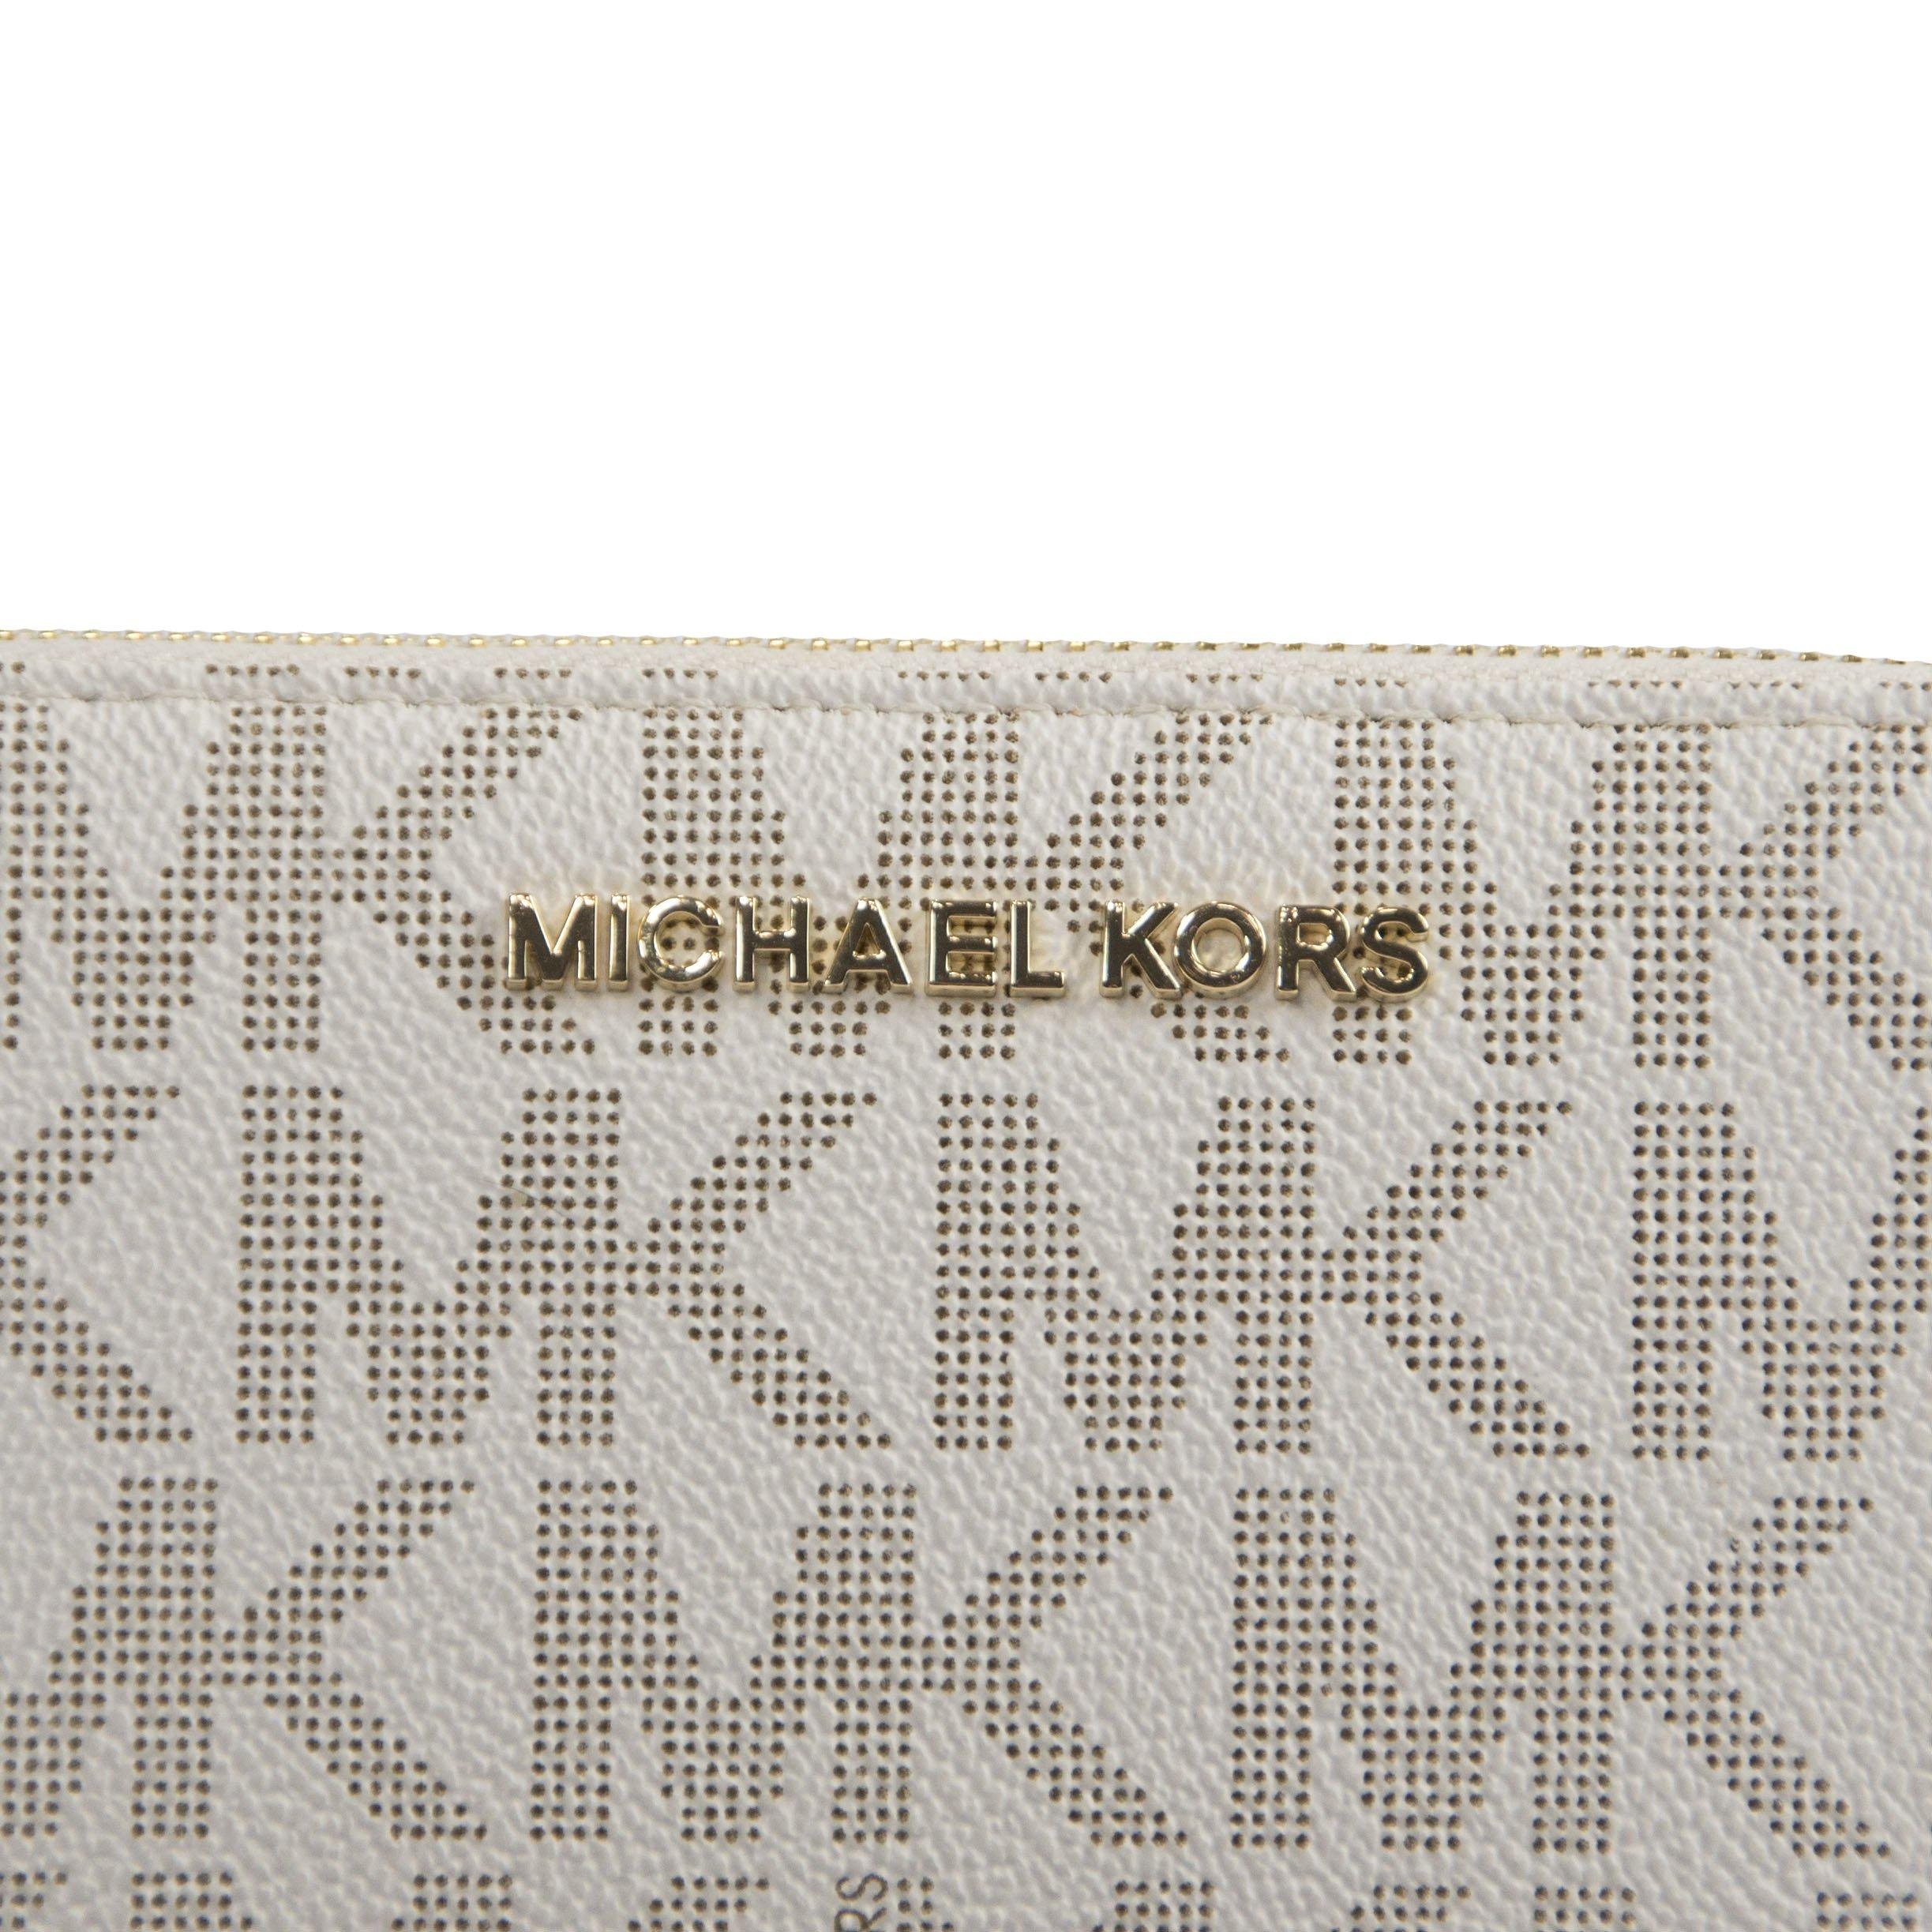 Michael Kors Vanilla Monogram Acorn Leather Large Zip Around Travel Wallet by Michael Kors (Image #4)